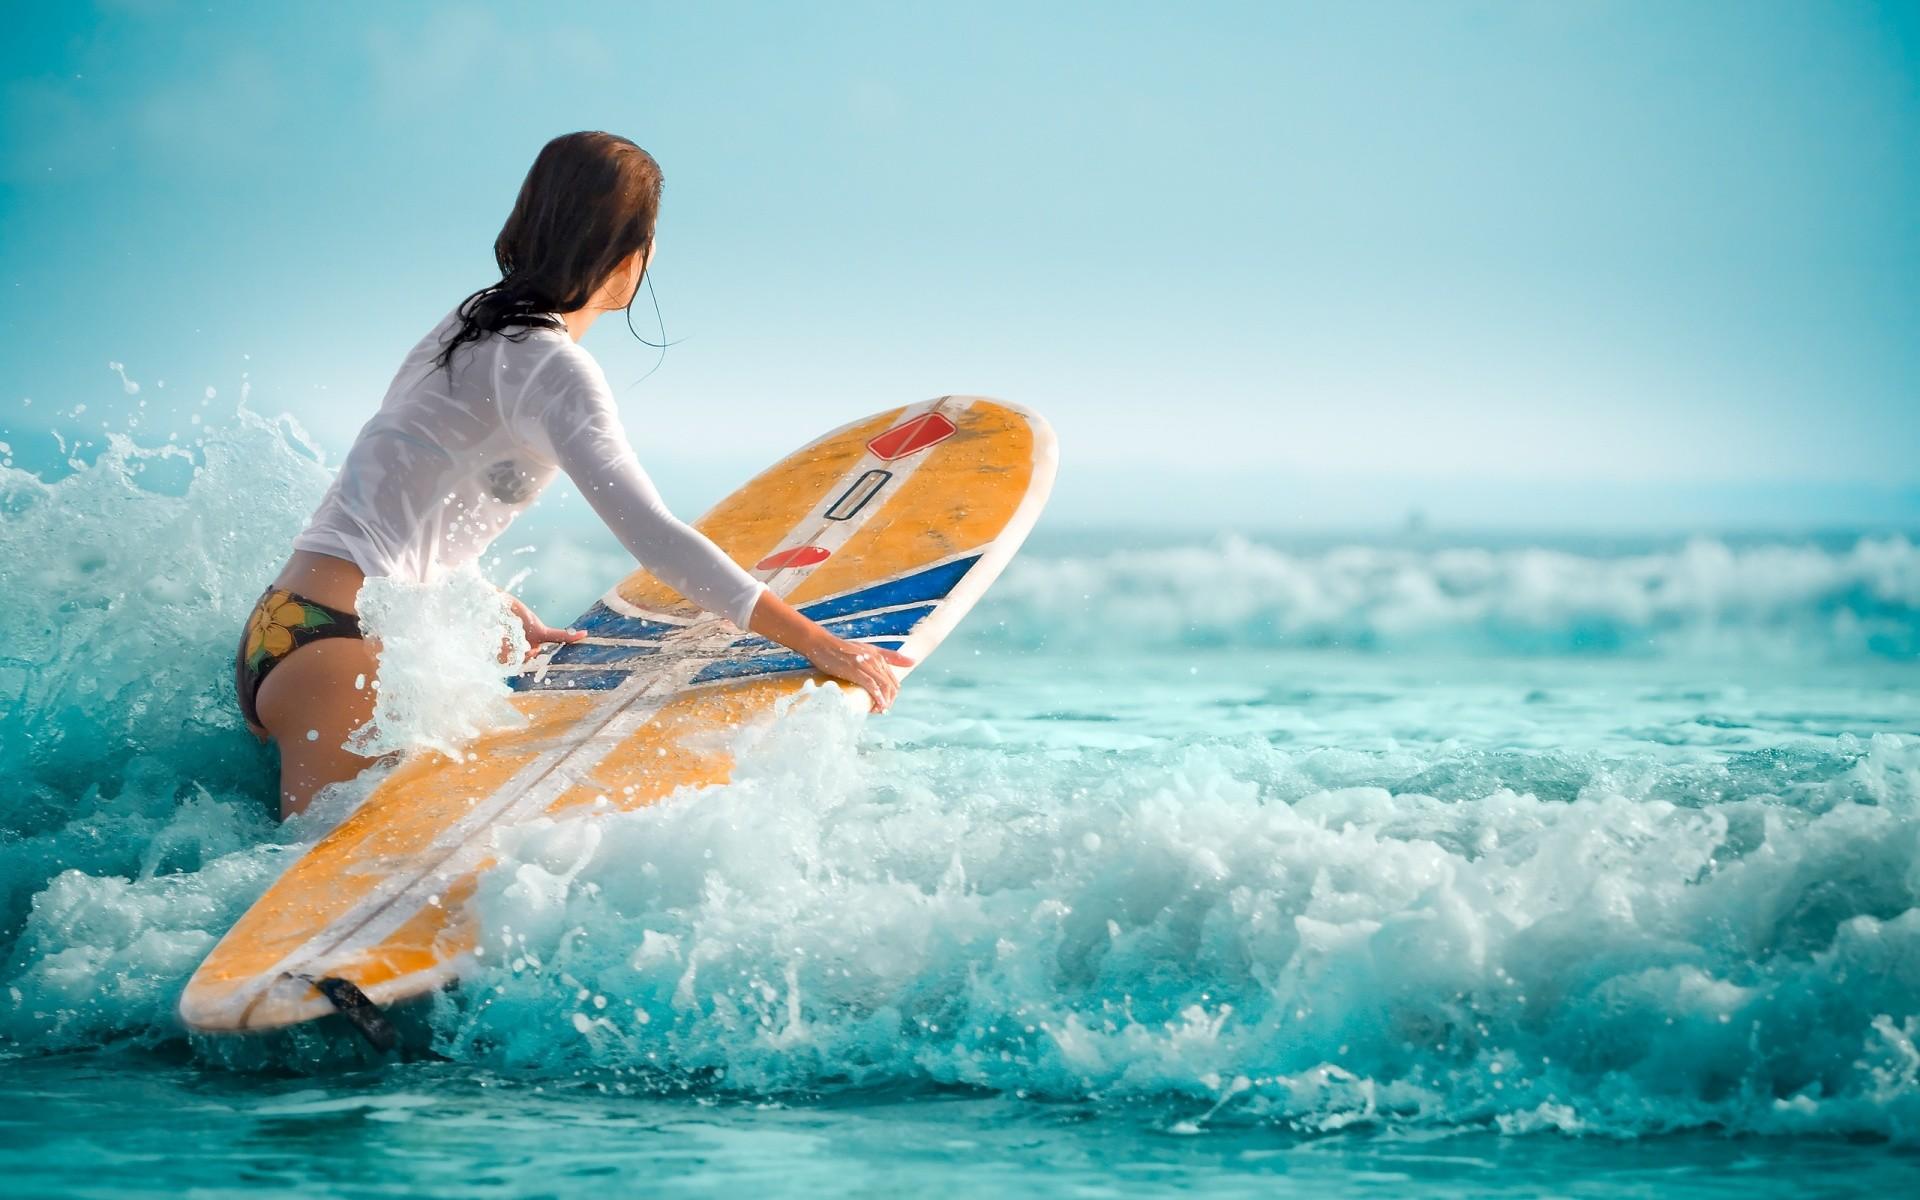 Girls Surfing Wallpaper 65 Images